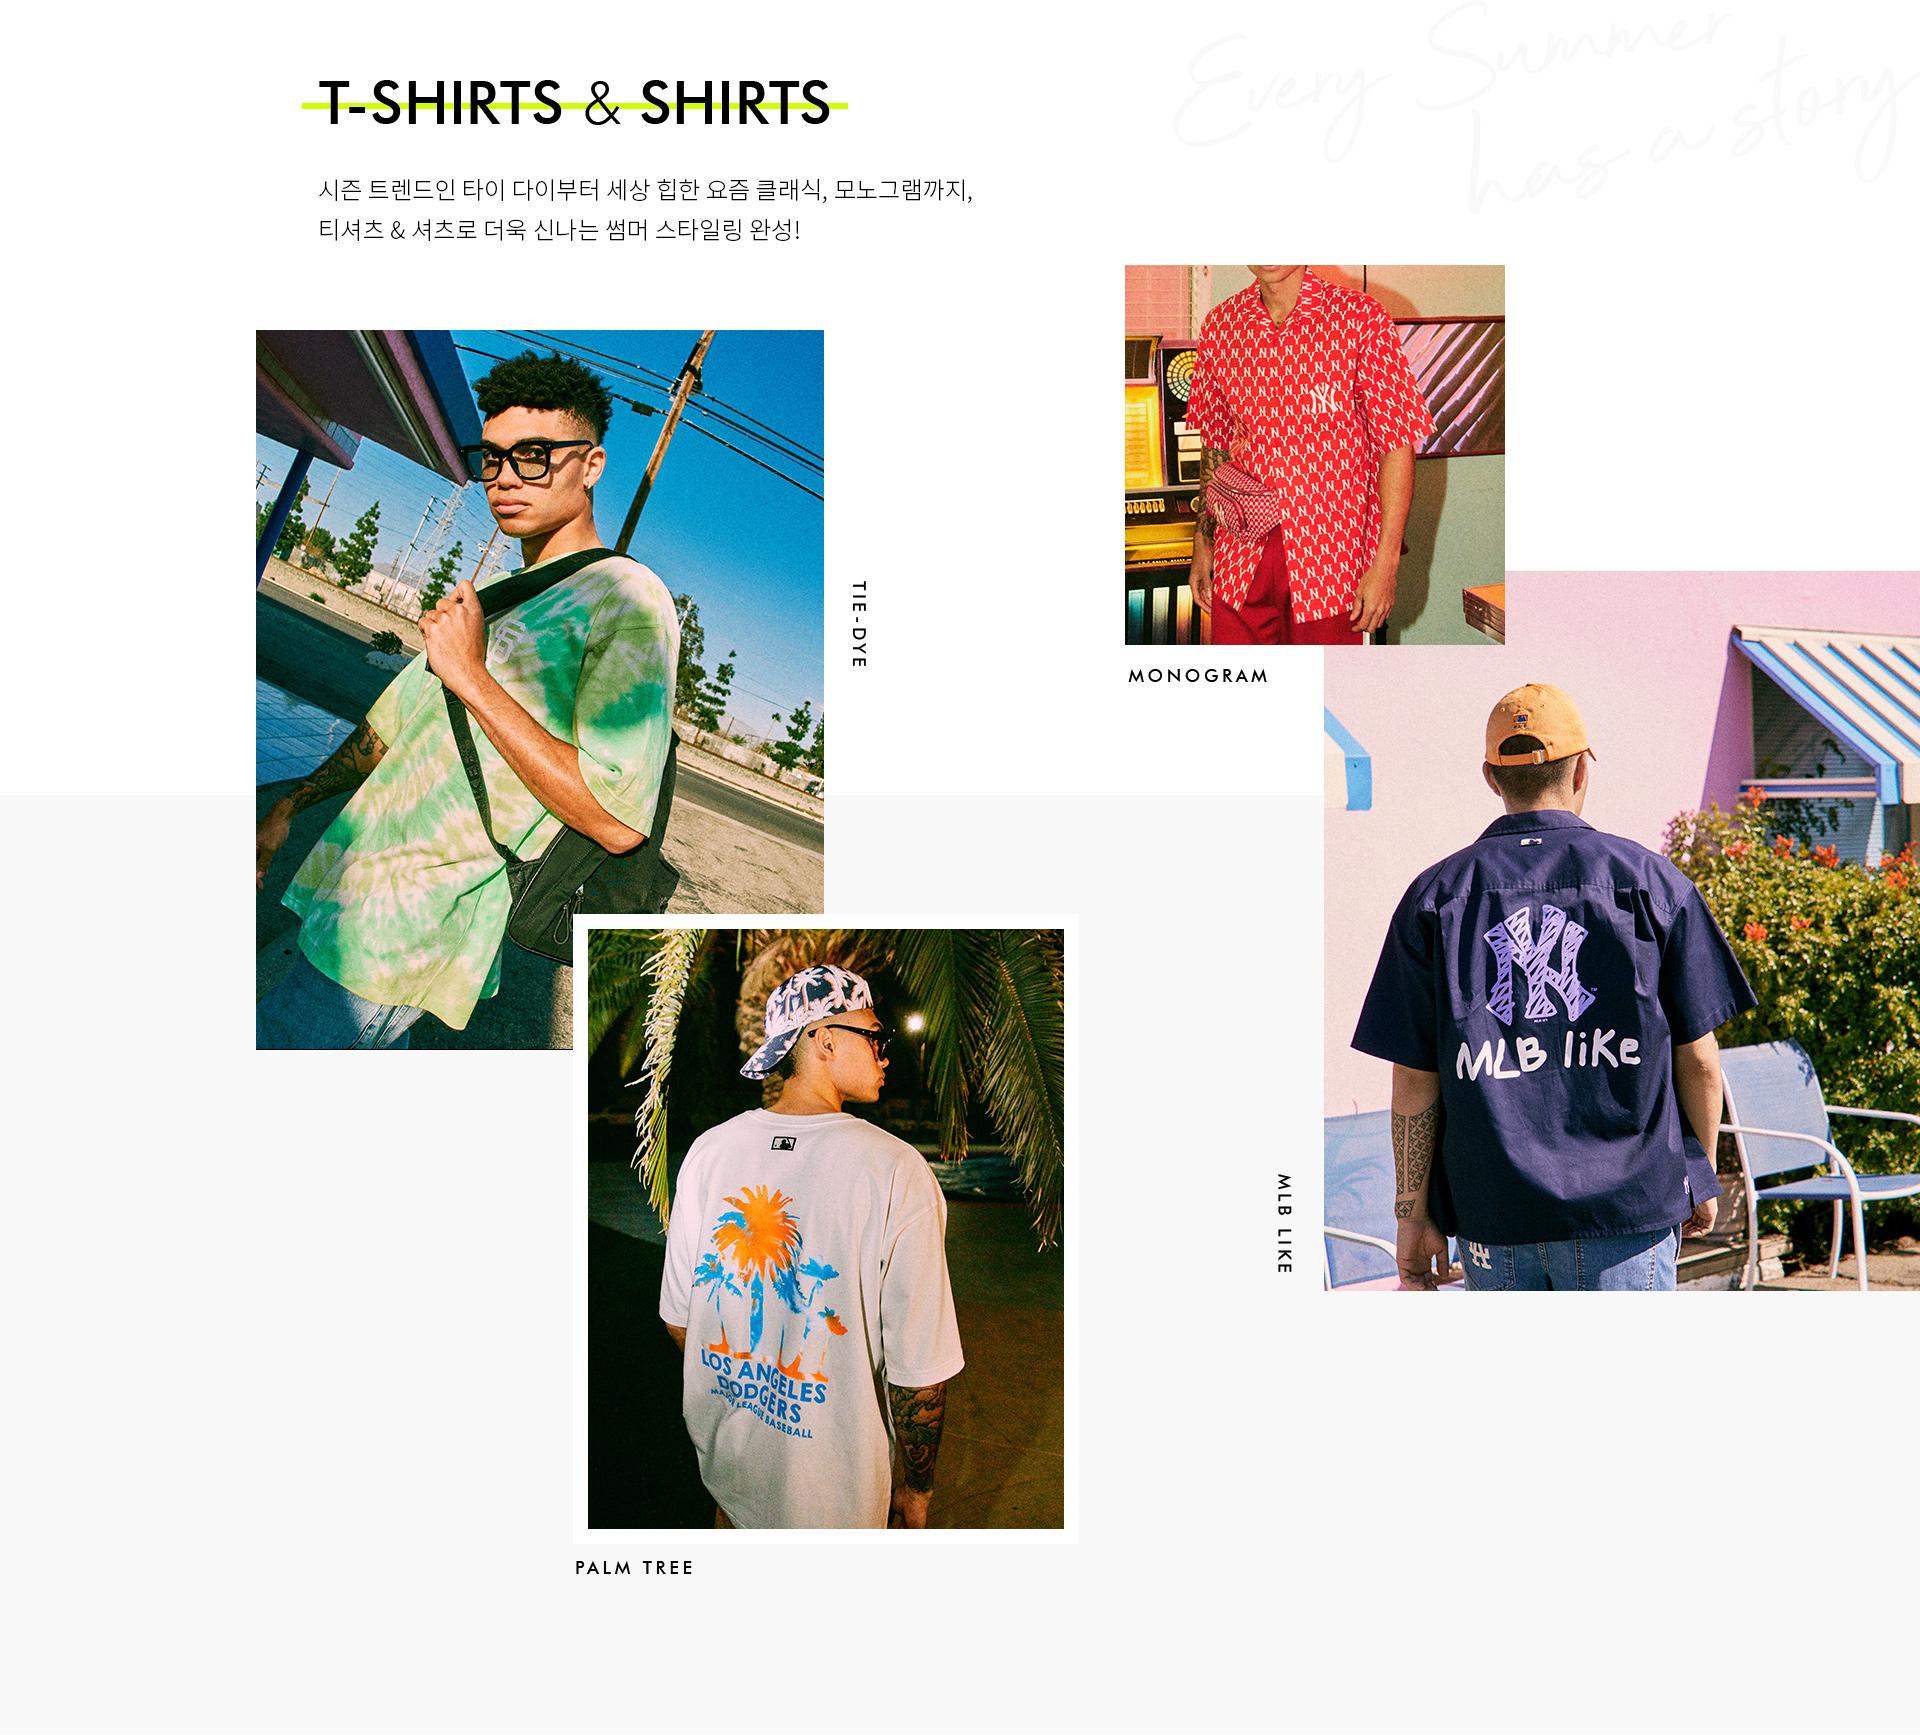 T-SHIRTS & SHIRTS 시즌 트렌드인 타이 다이부터 세상 힙한 요즘 클래식, 모노그램까지, 티셔츠 & 셔츠로 더욱 신나는 썸머 스타일링 완성! TIE-DYE PALM TREE MONOGRAM MLB LIKE